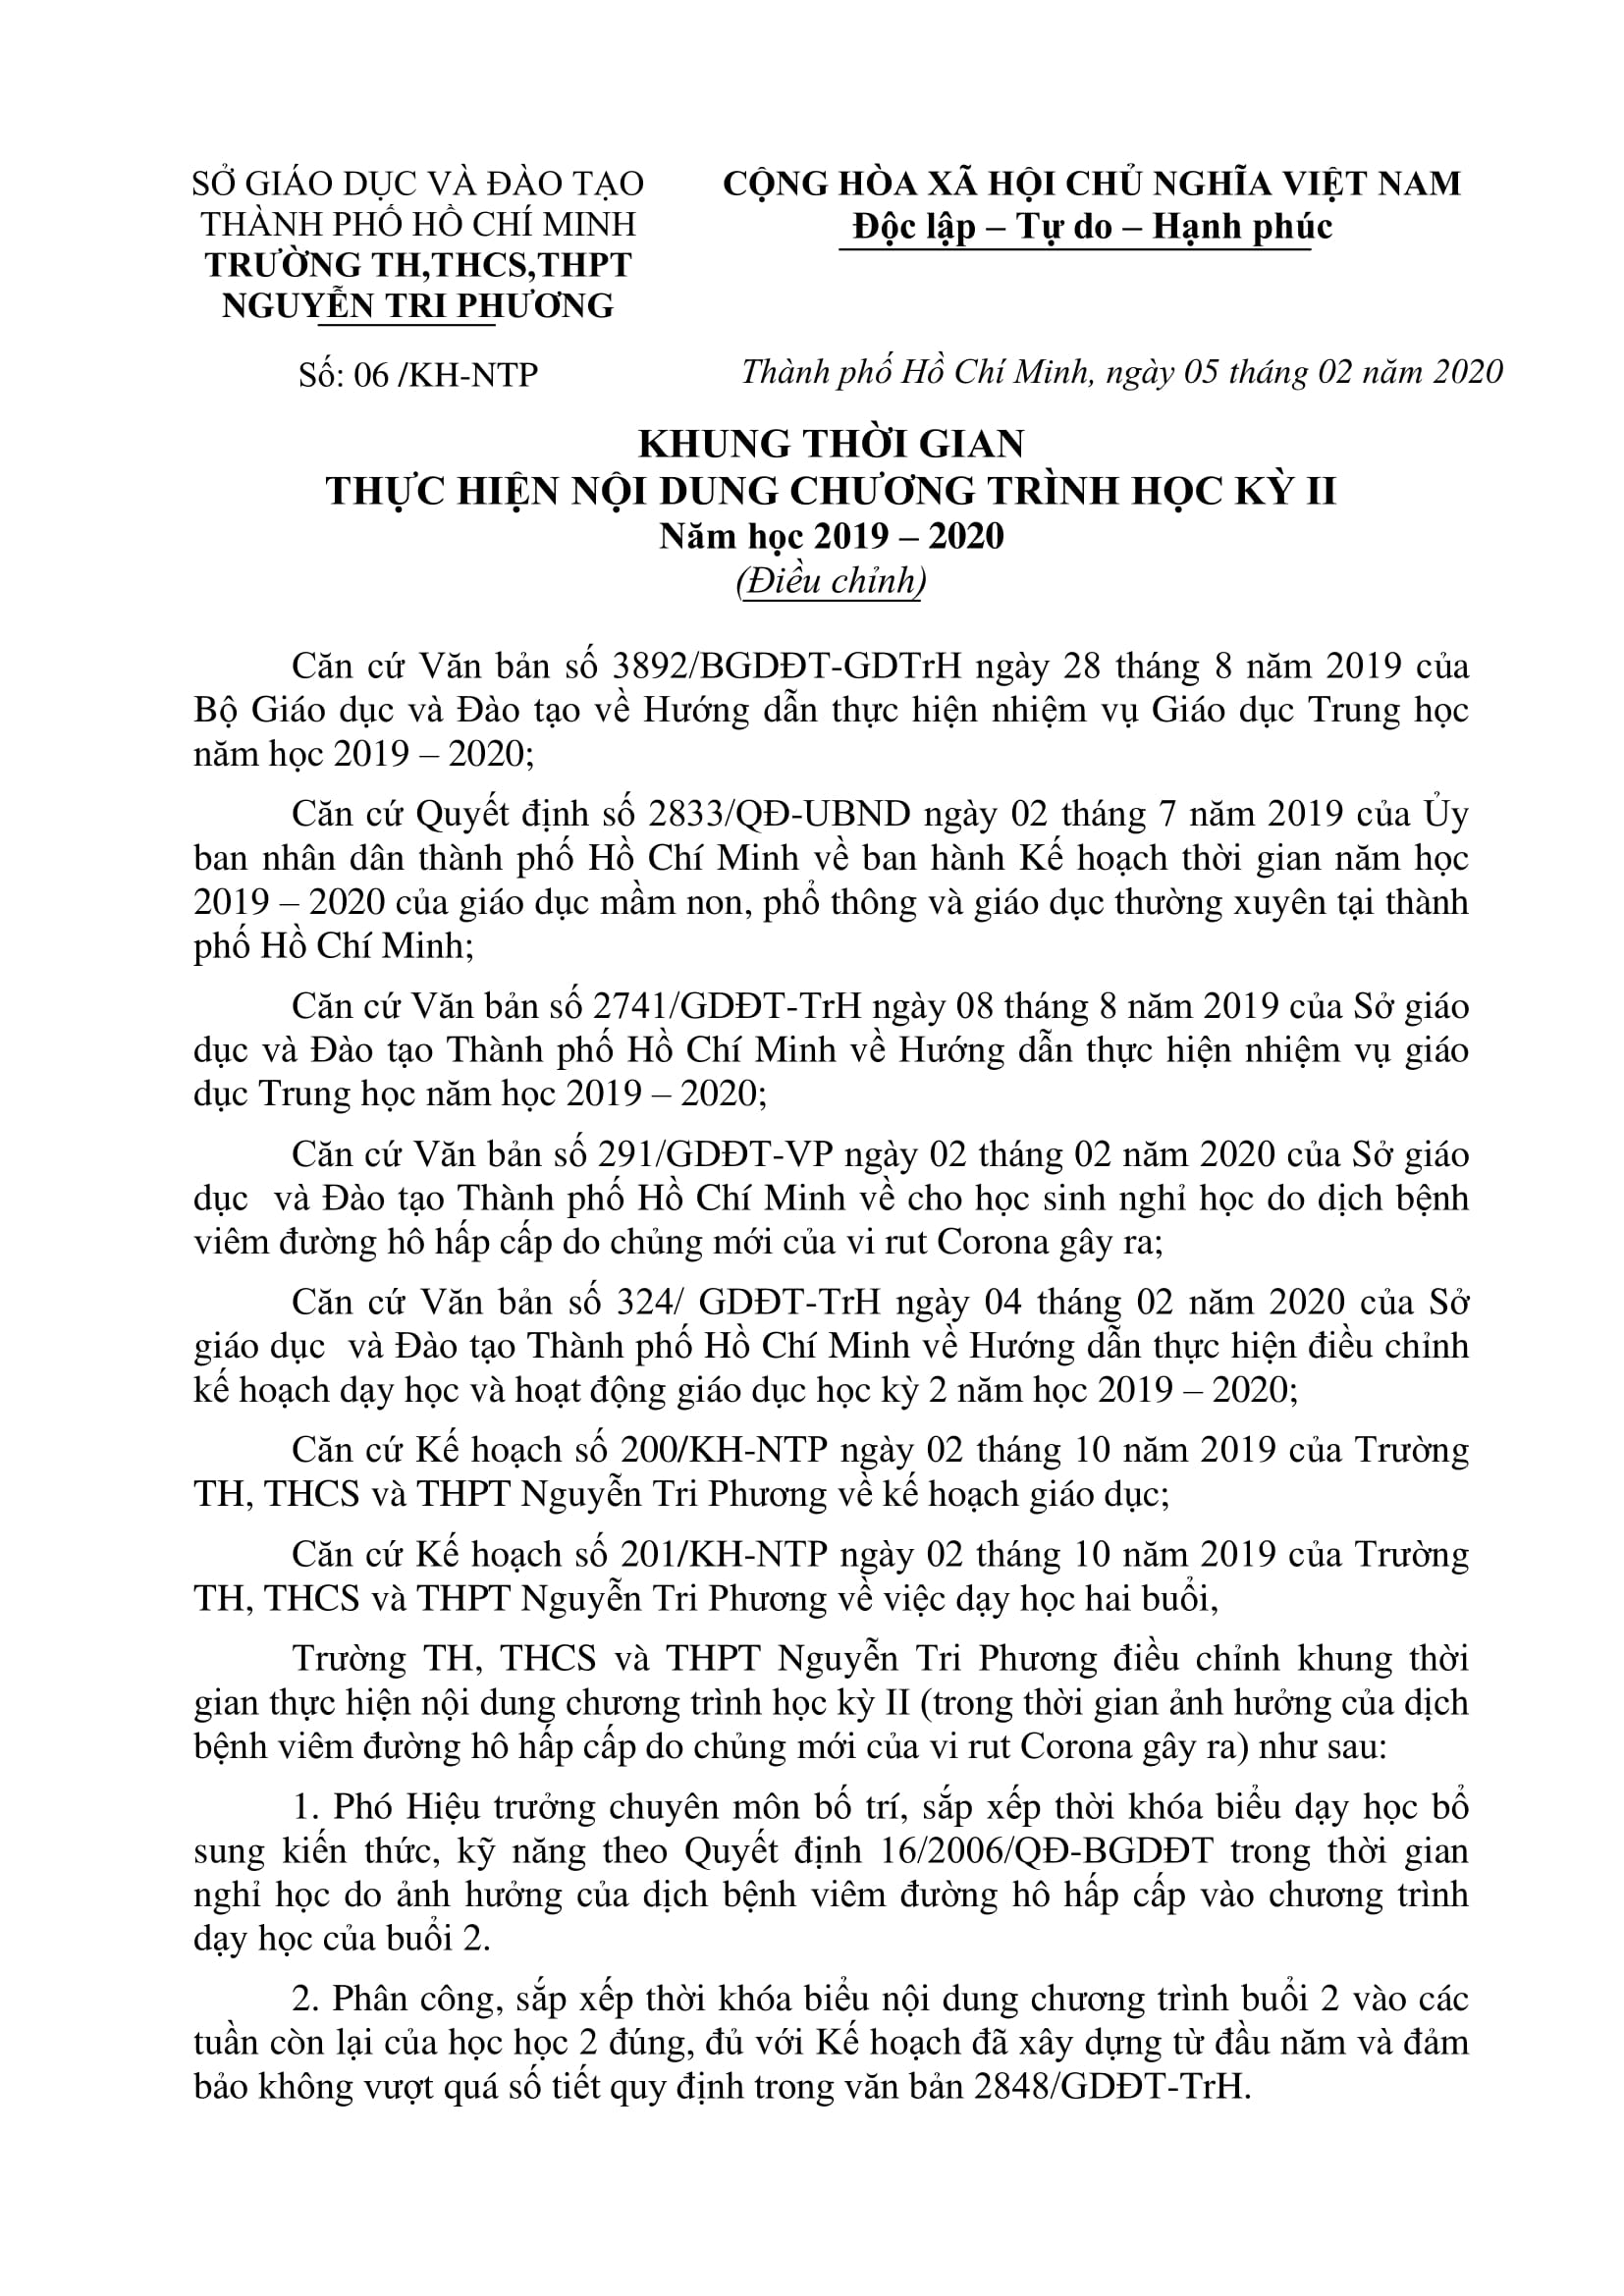 06 DIEU CHINH KHUNG THOI GIAN THUC HIEN CHUONG TRINH HKII 1